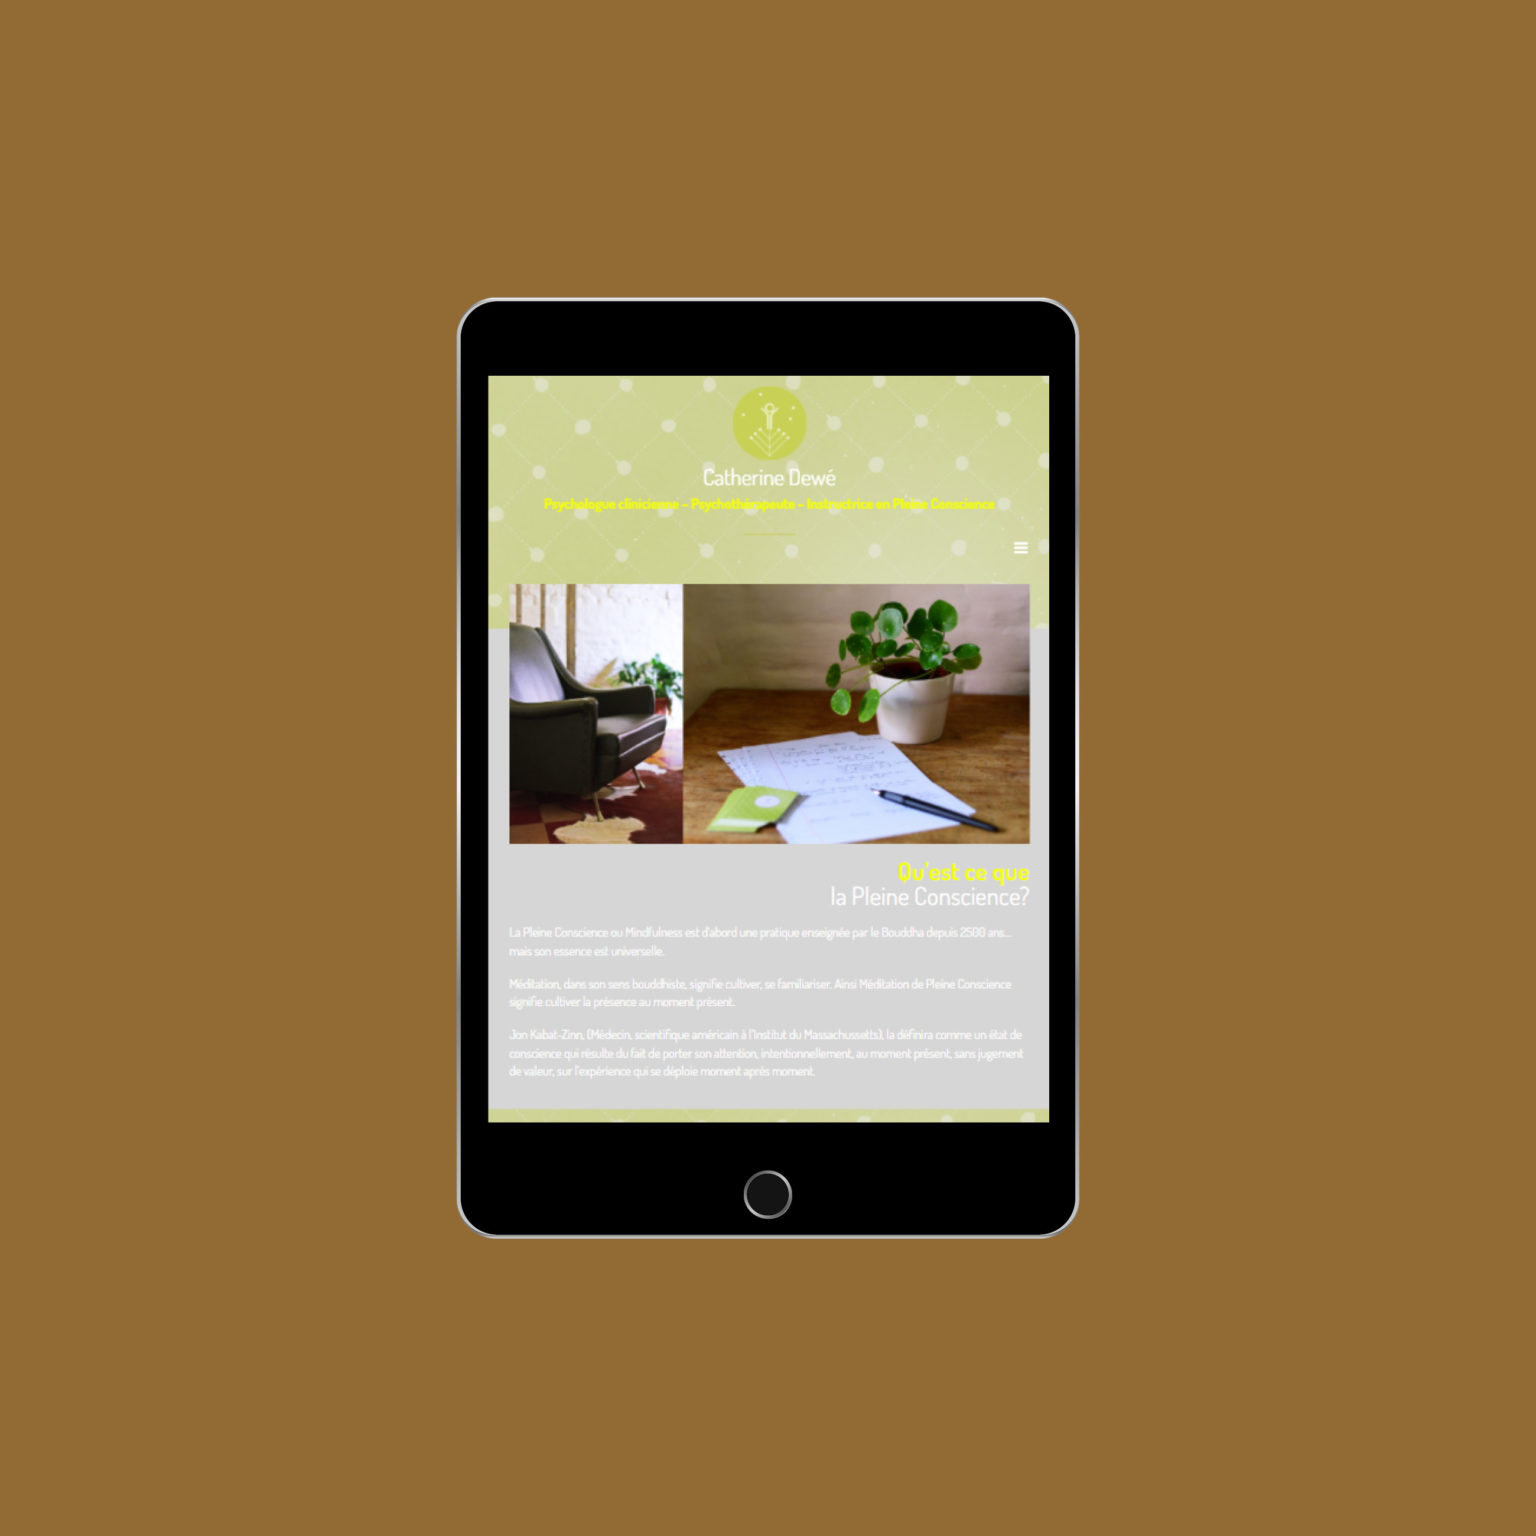 Miko Digital Agence Web à Liège - Psychologue Dewe